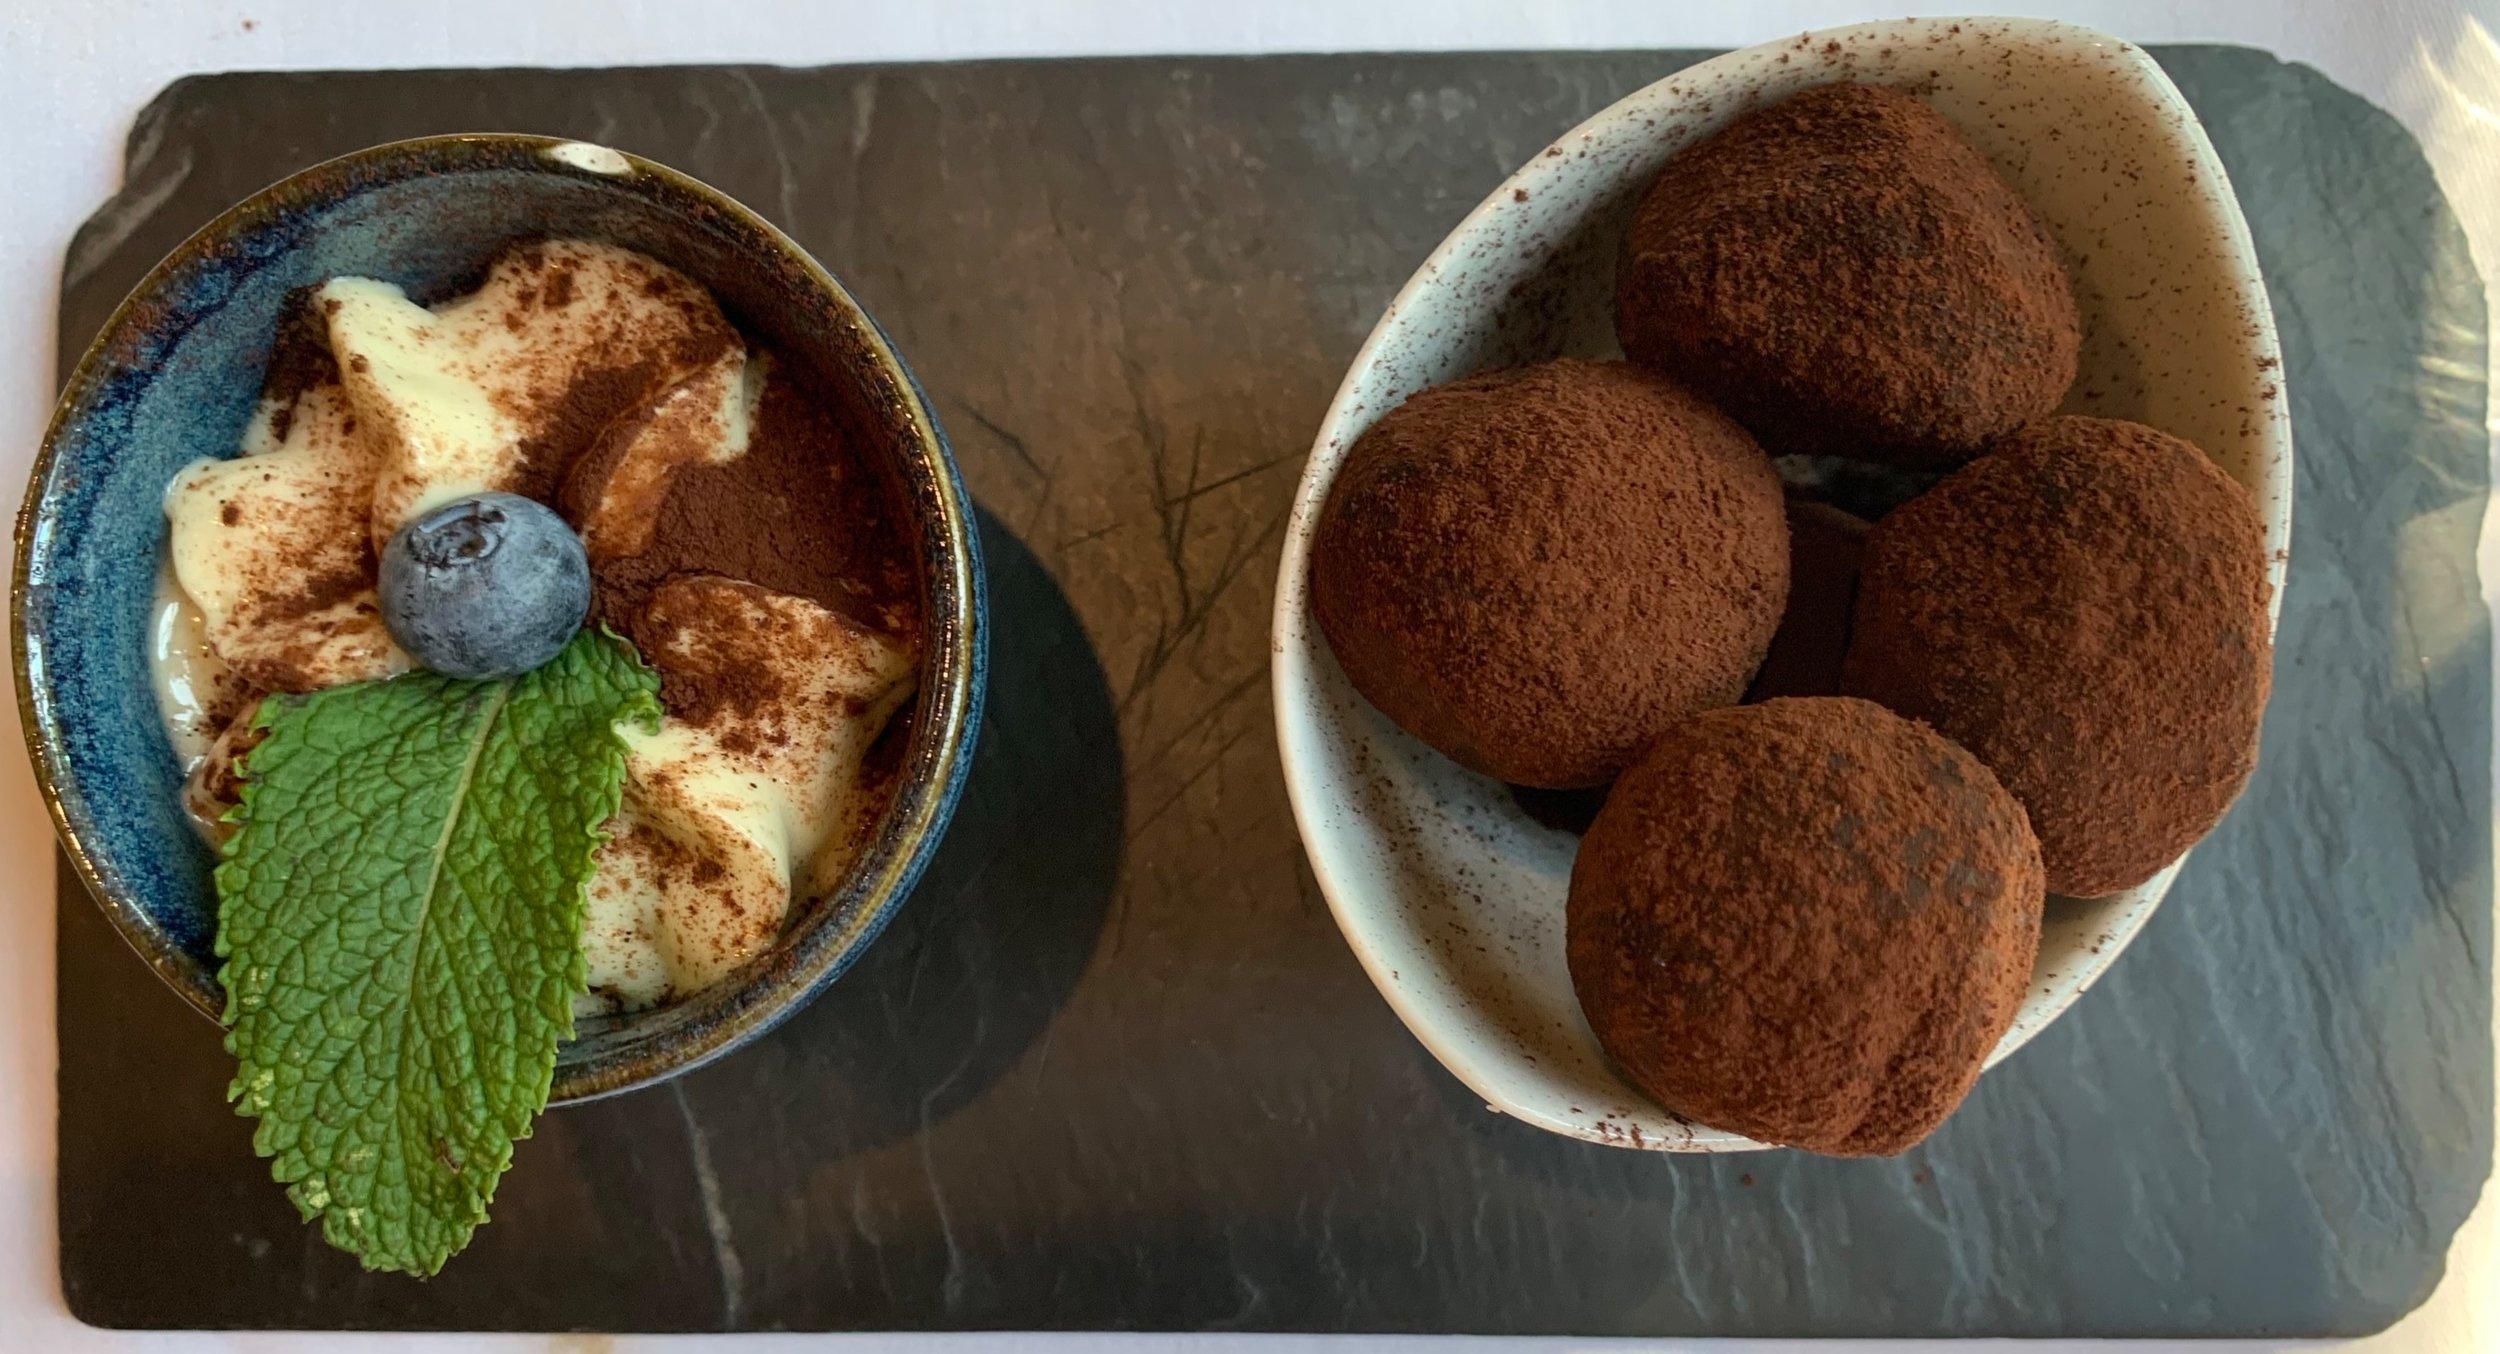 Dessert: truffles with Baileys cream